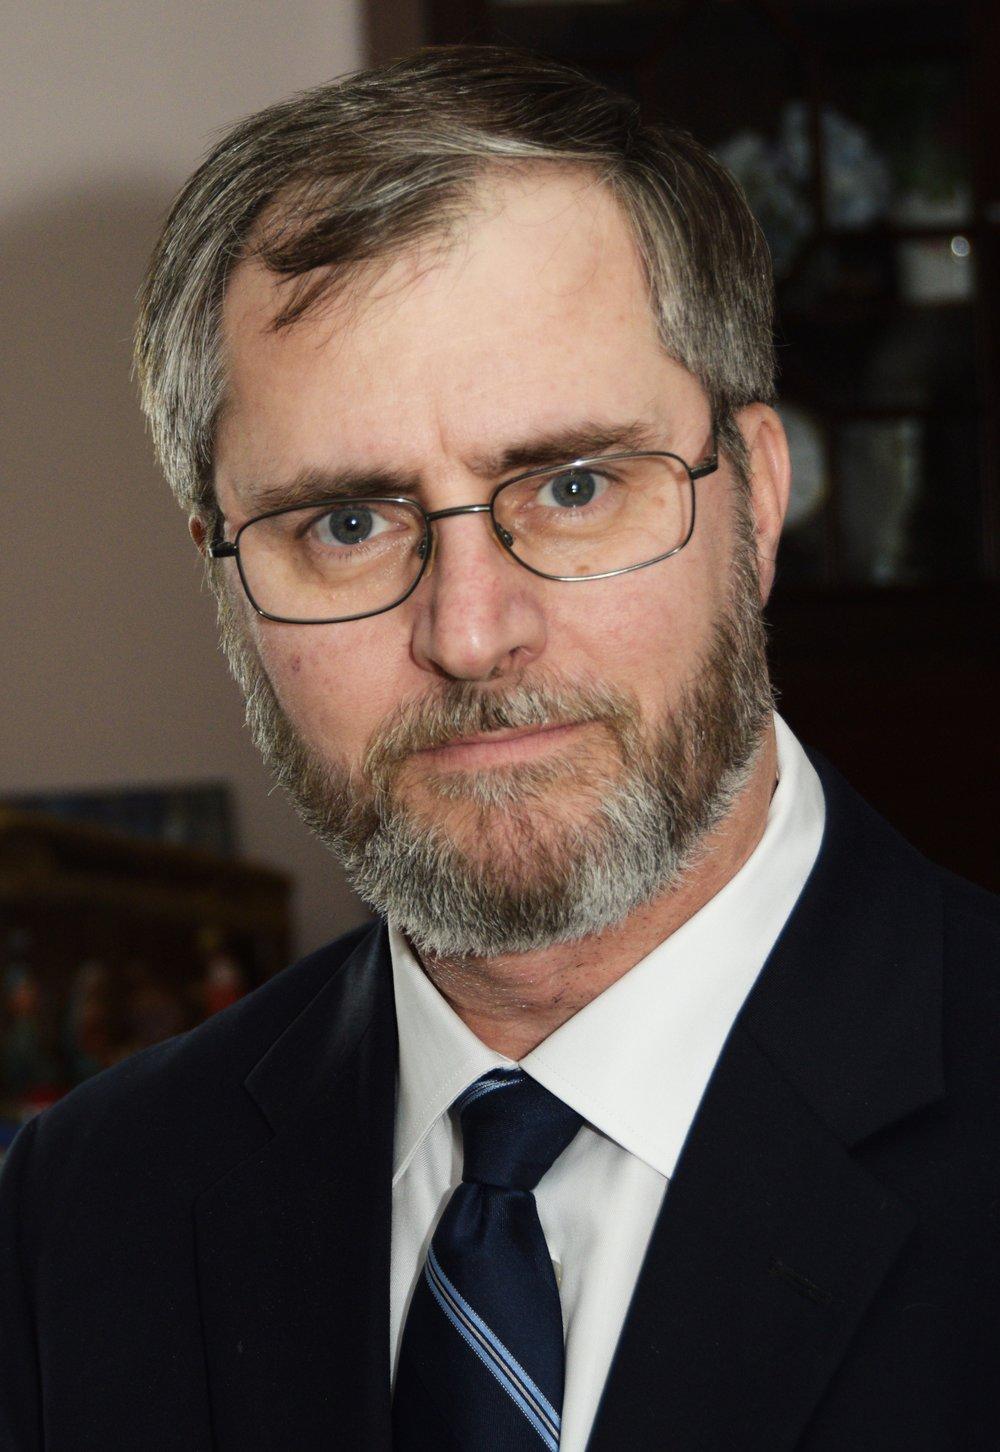 Marcel Boudreau